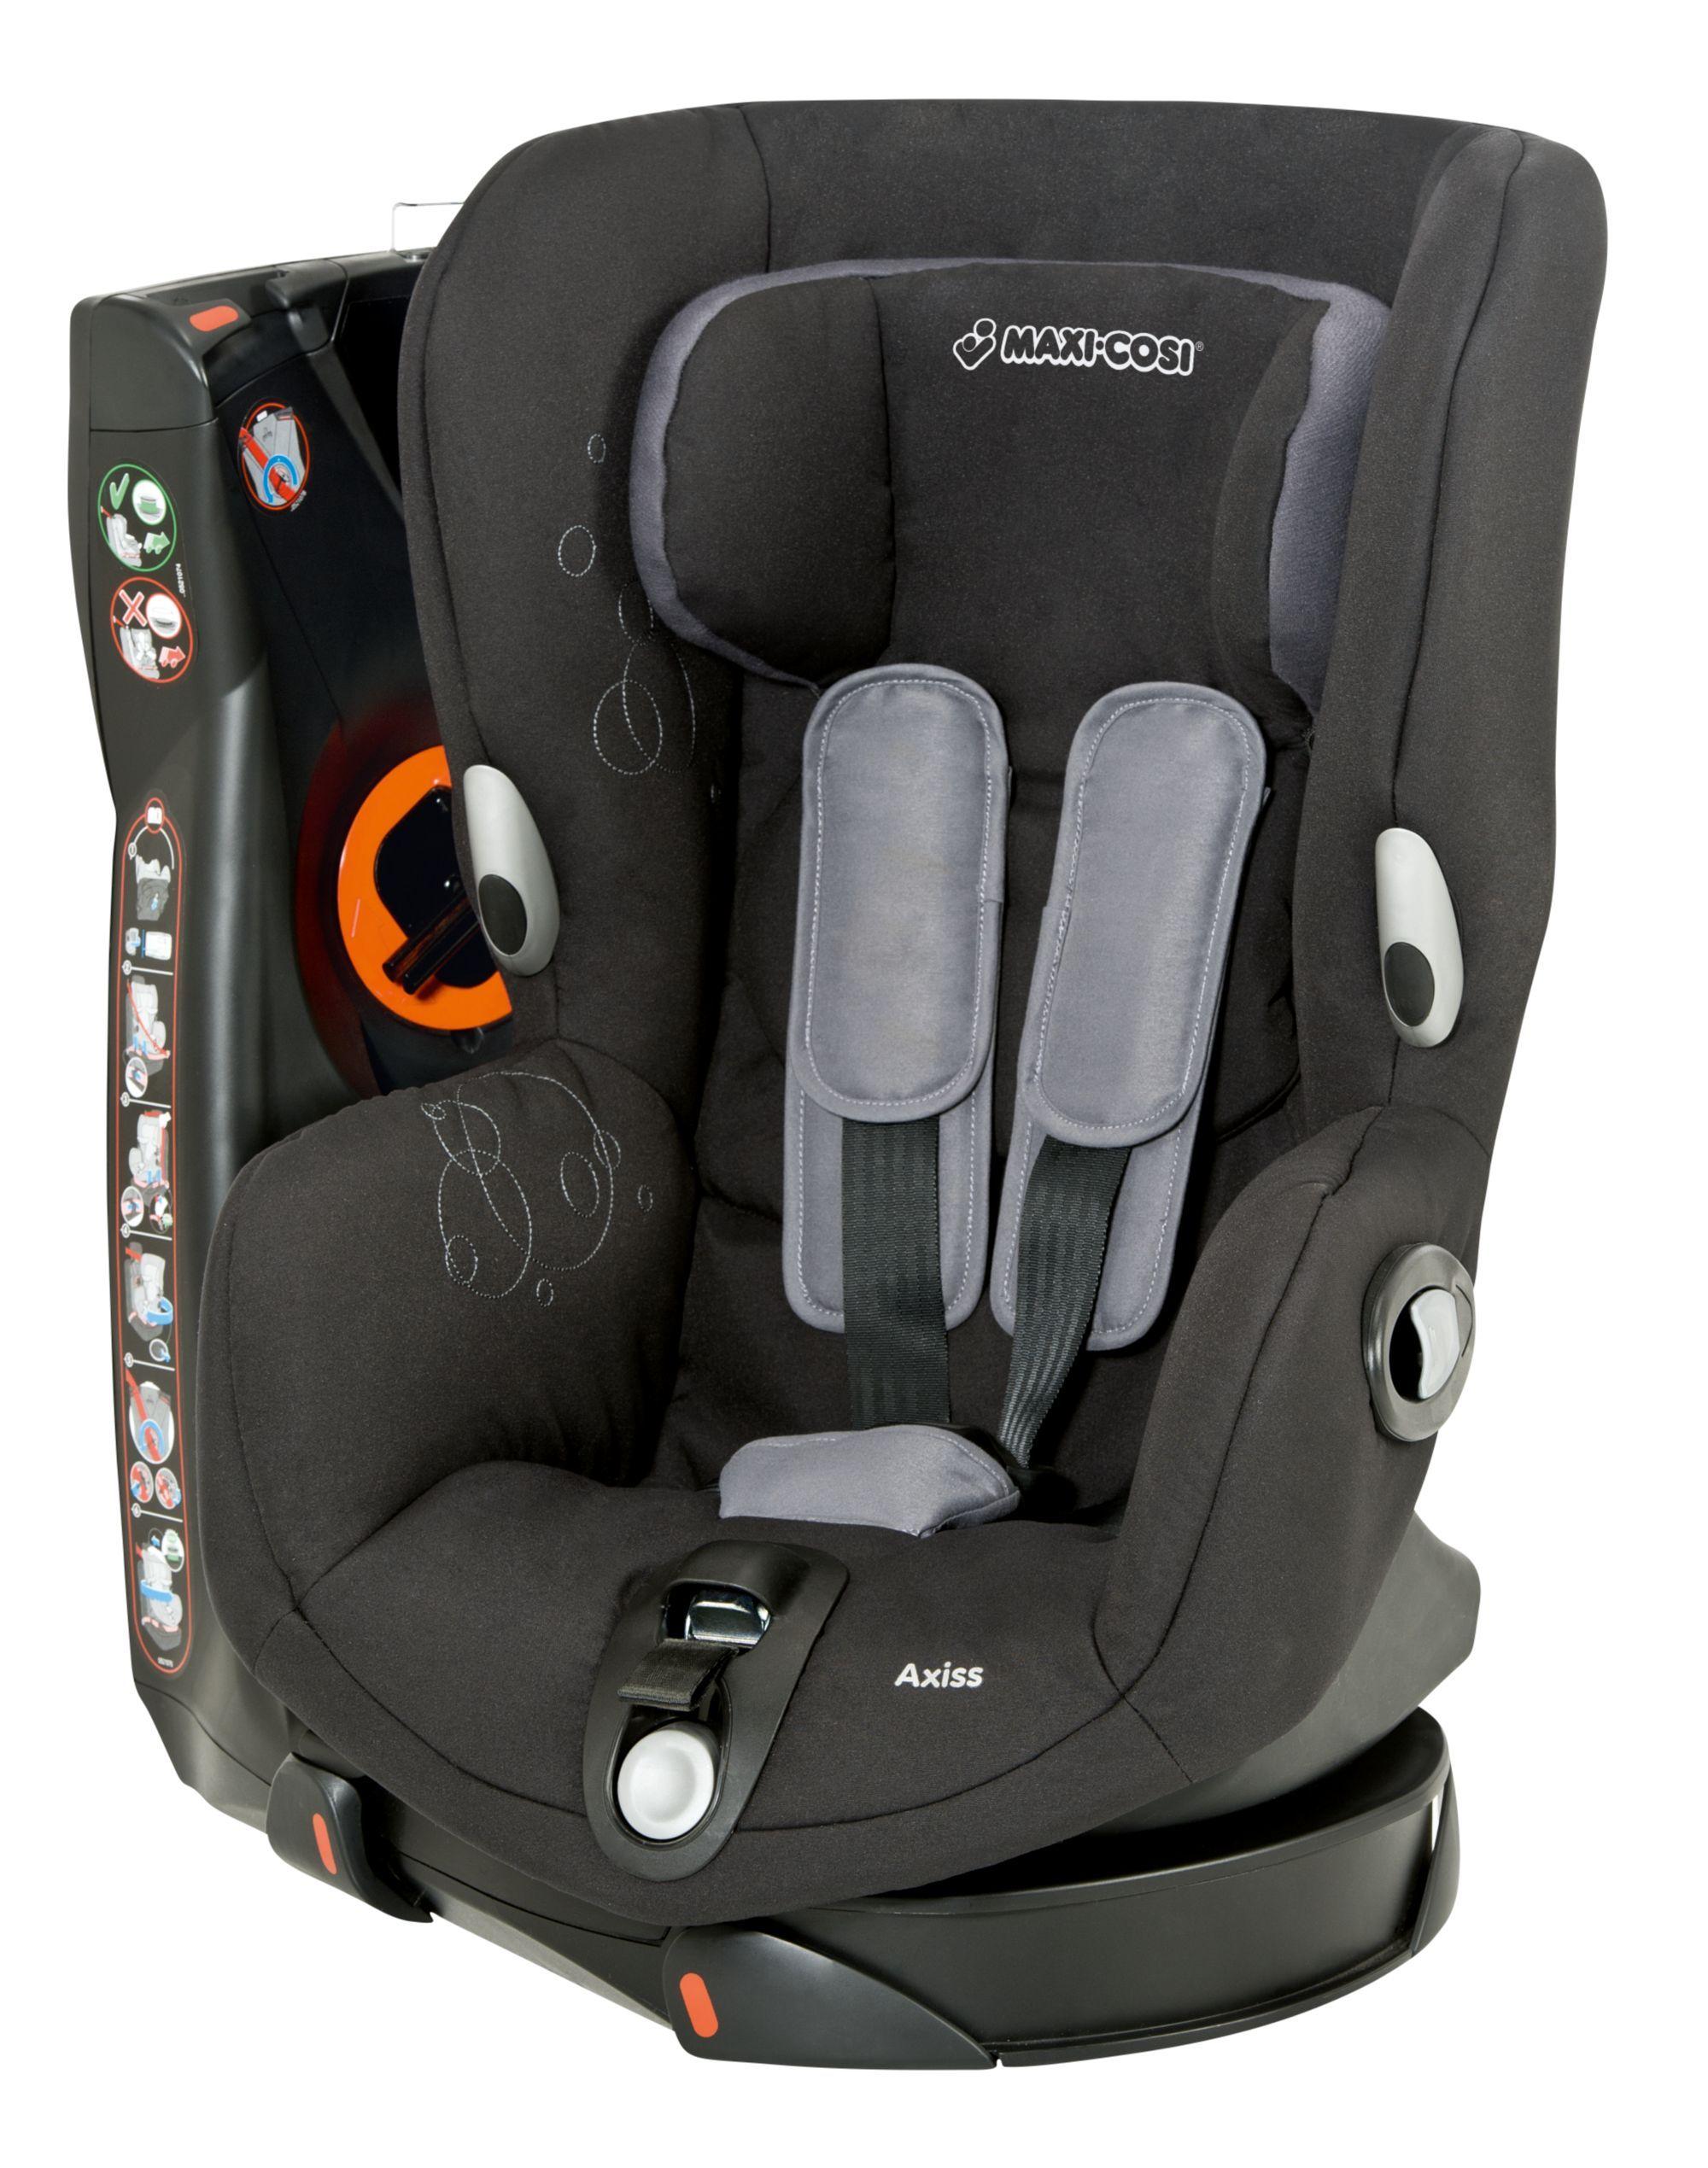 MaxiCosi Axiss Car Seat Total Black Toddler car seat